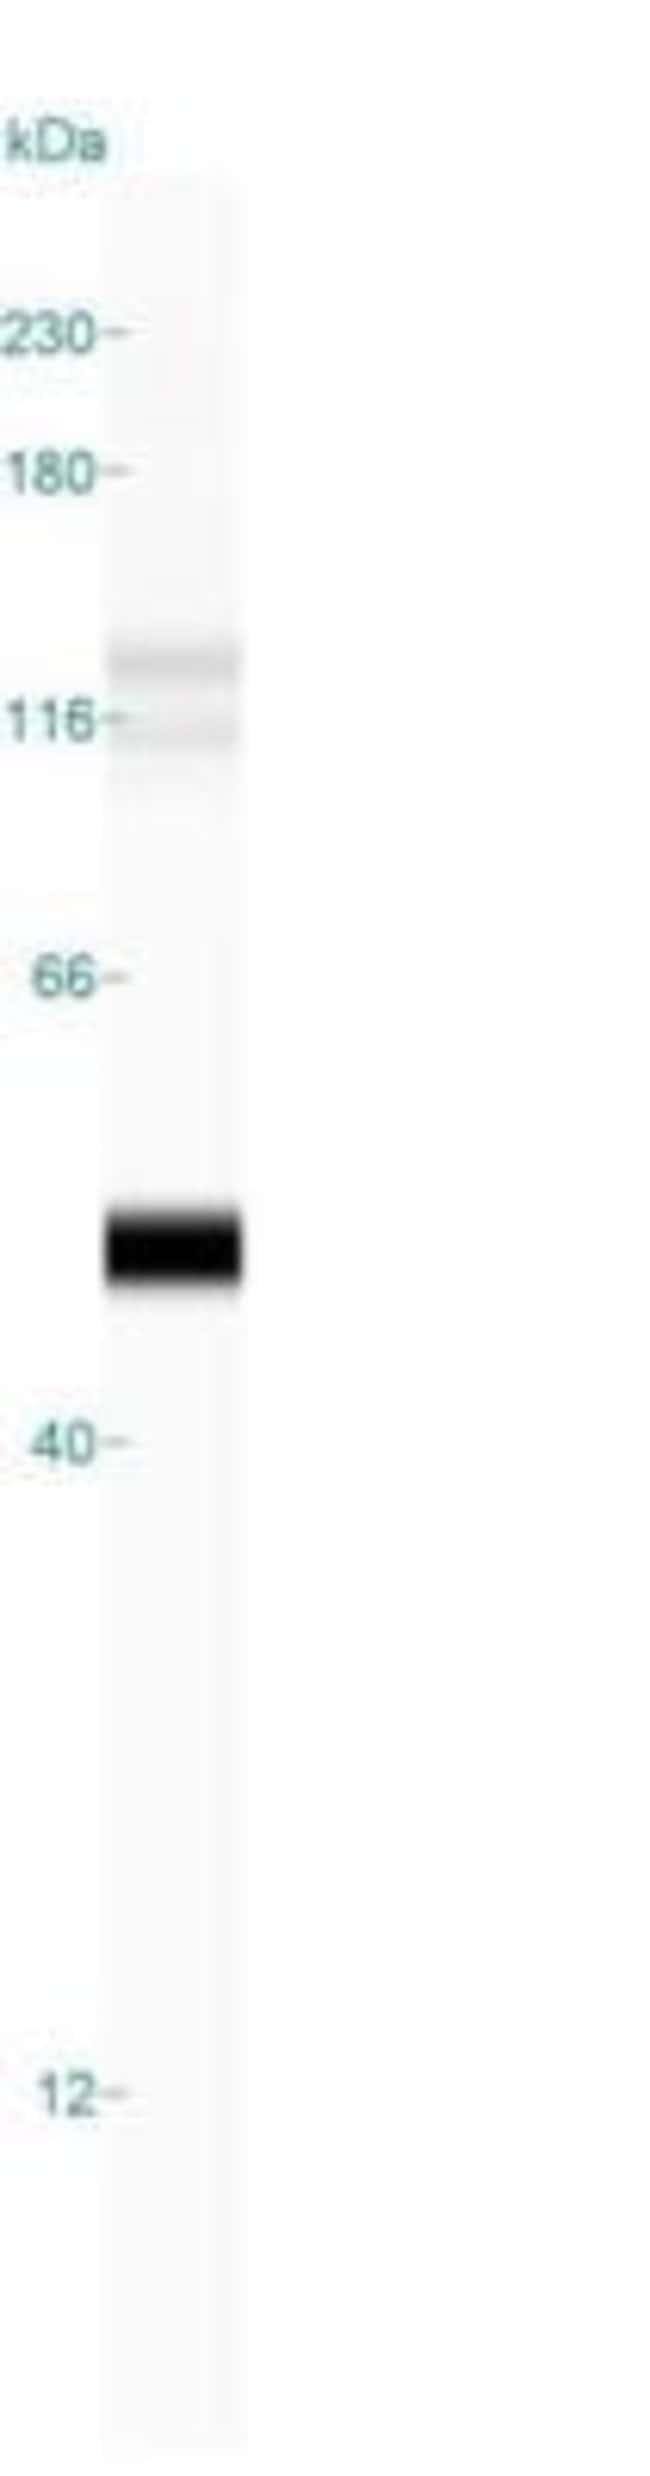 Mouse anti-Cytokeratin 19, Clone: BA17, Azide Free, Novus Biologicals:Antibodies:Primary